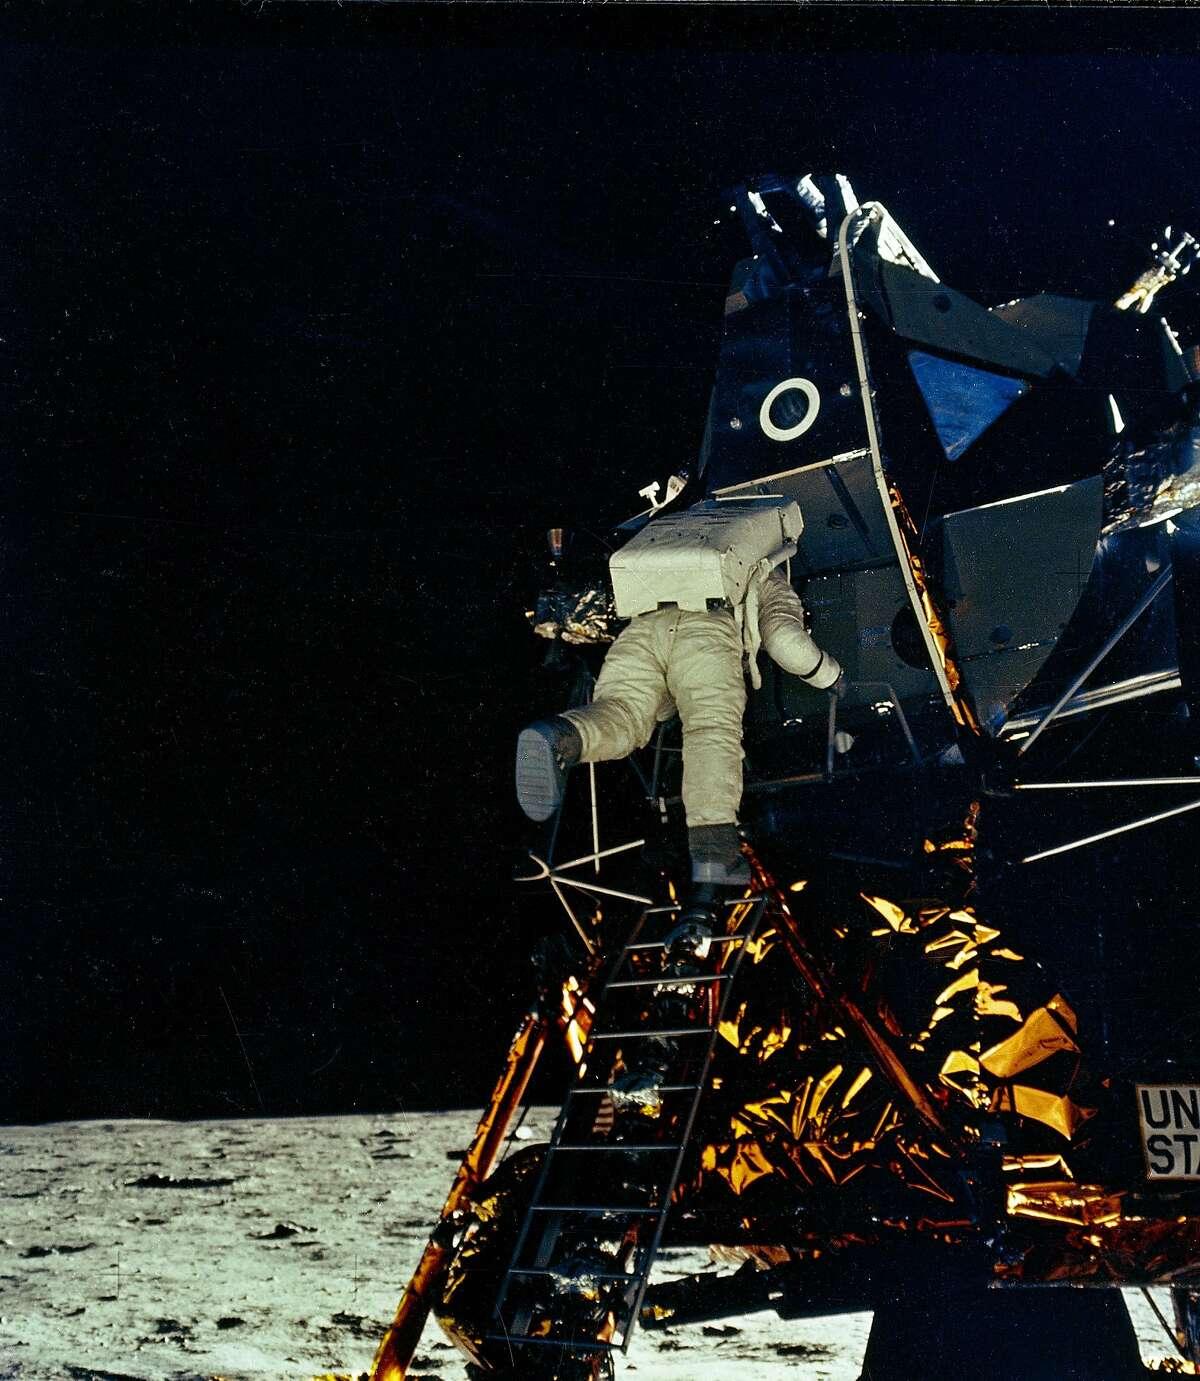 Apollo 11 astronaut Edwin Aldrin, Jr. egresses the luna module on the moon.